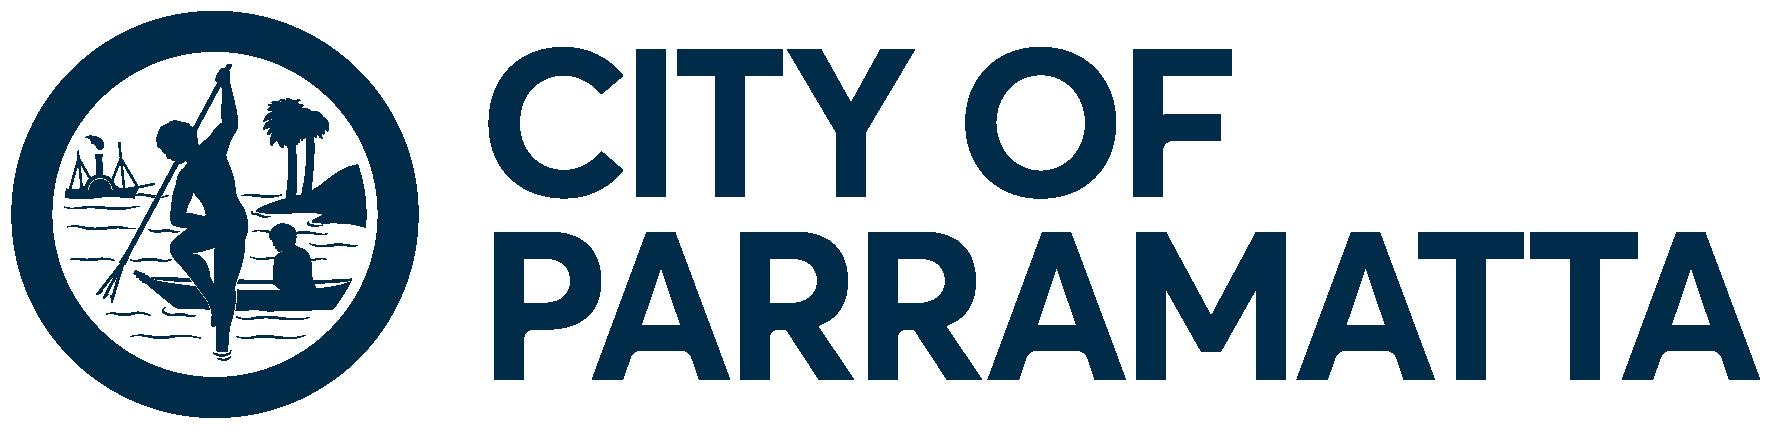 parramatta council commercial da application form